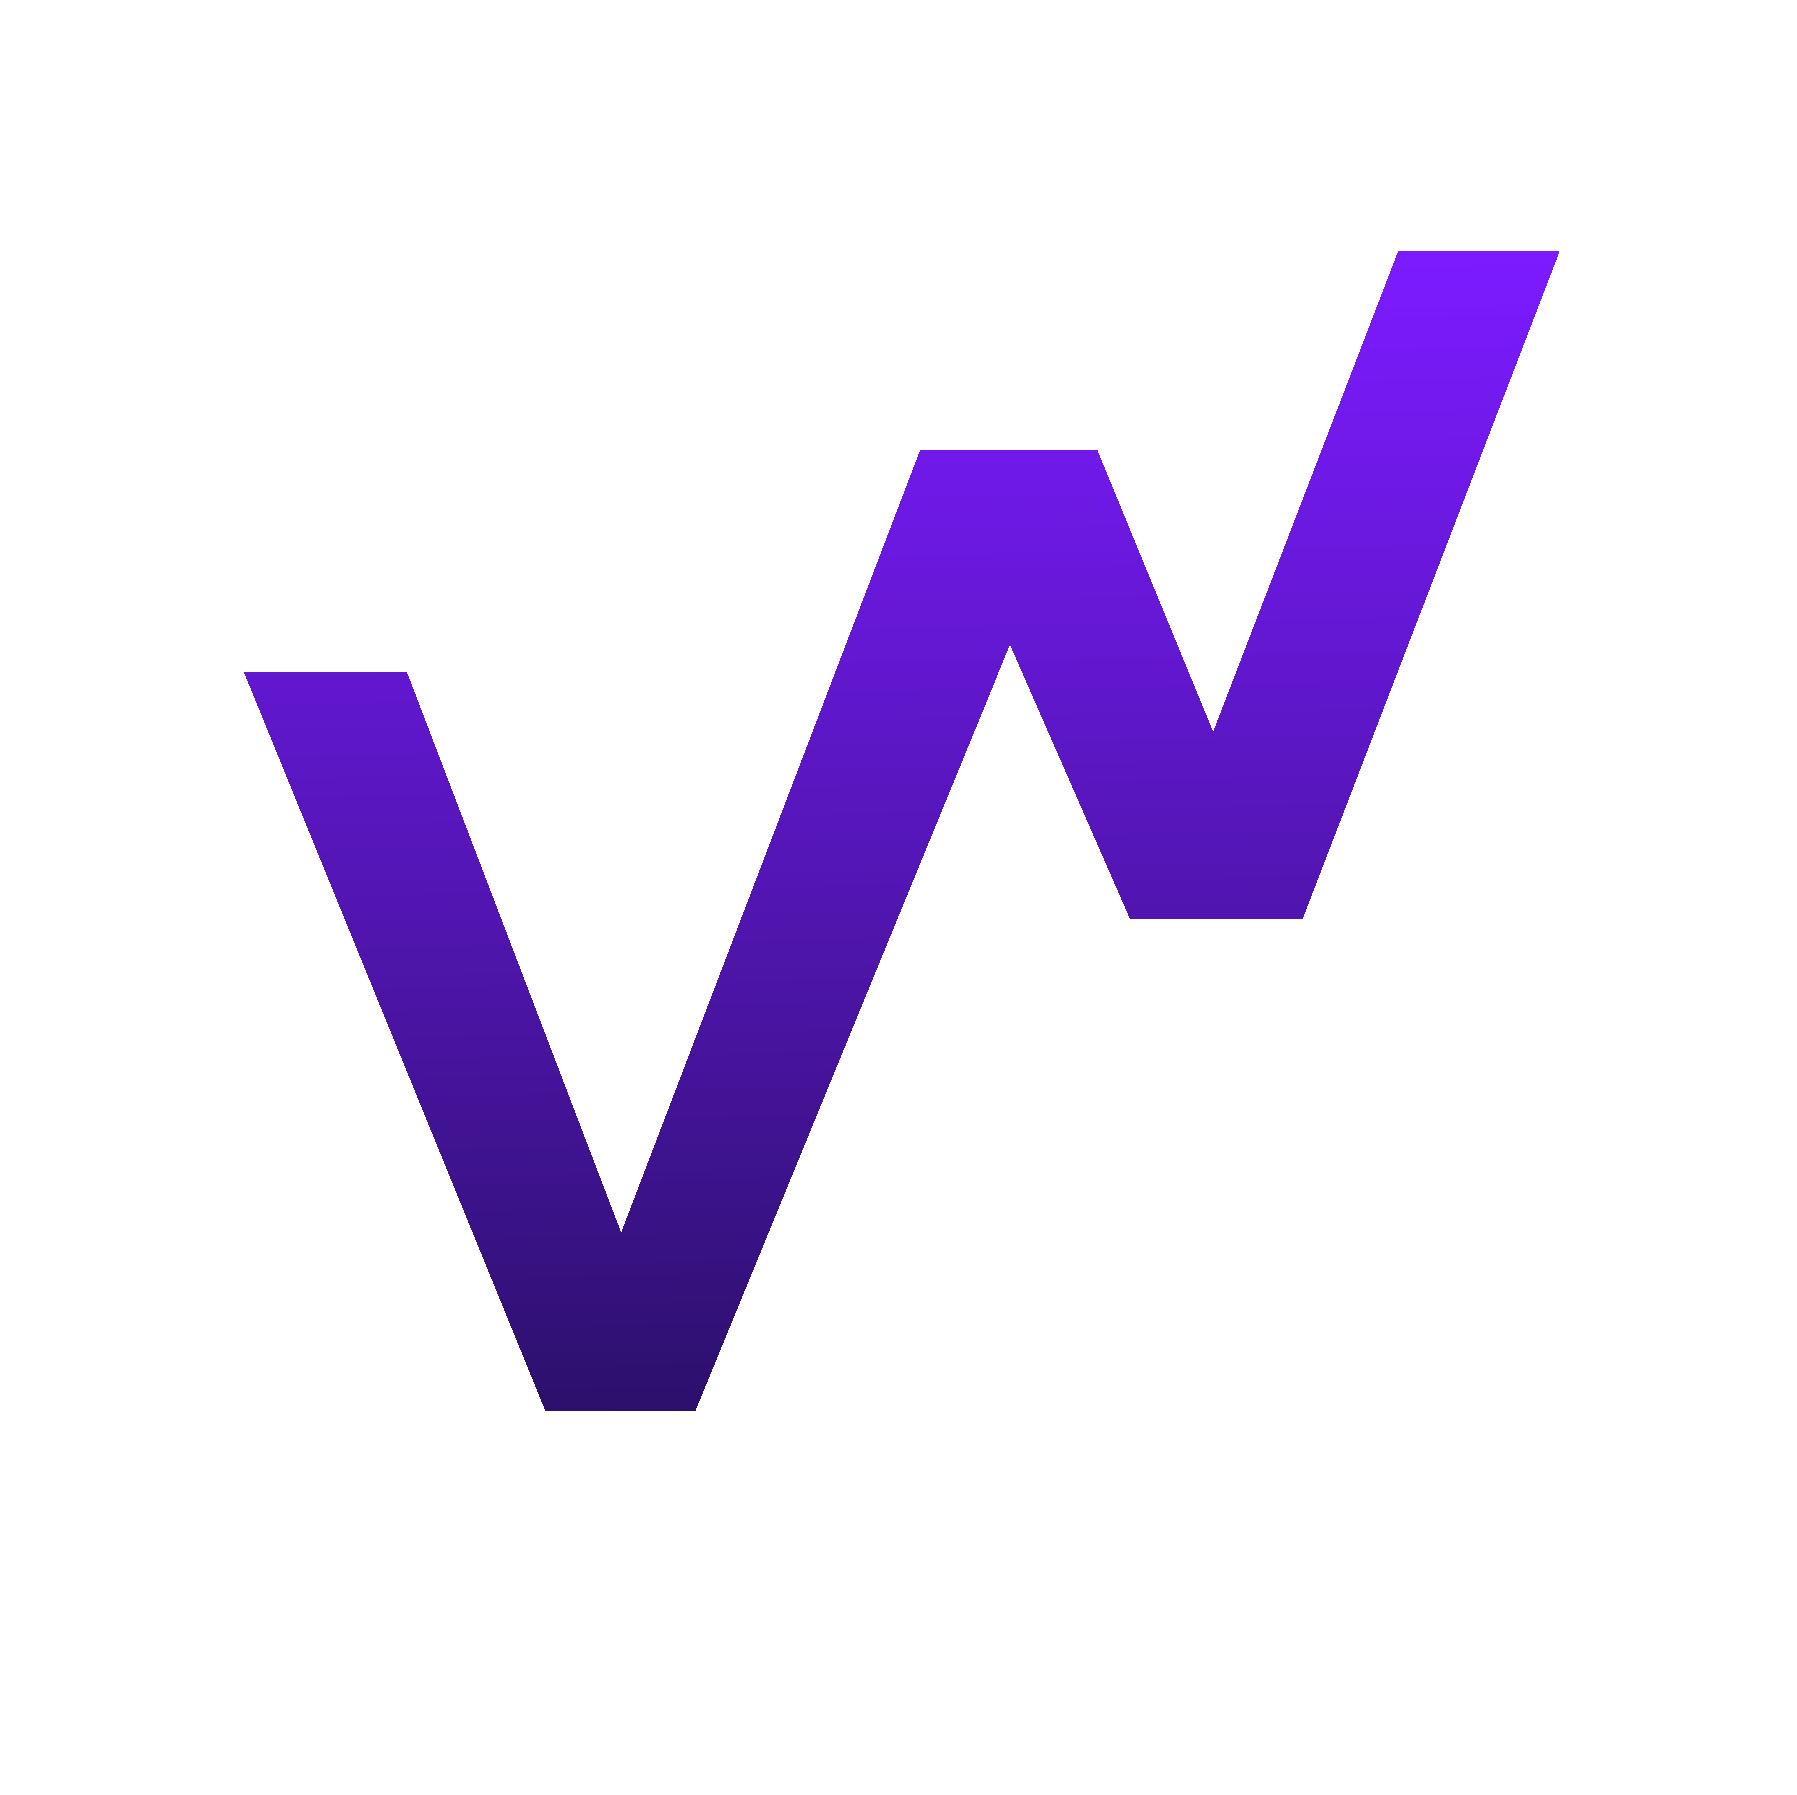 VYTALS benefit icon speed